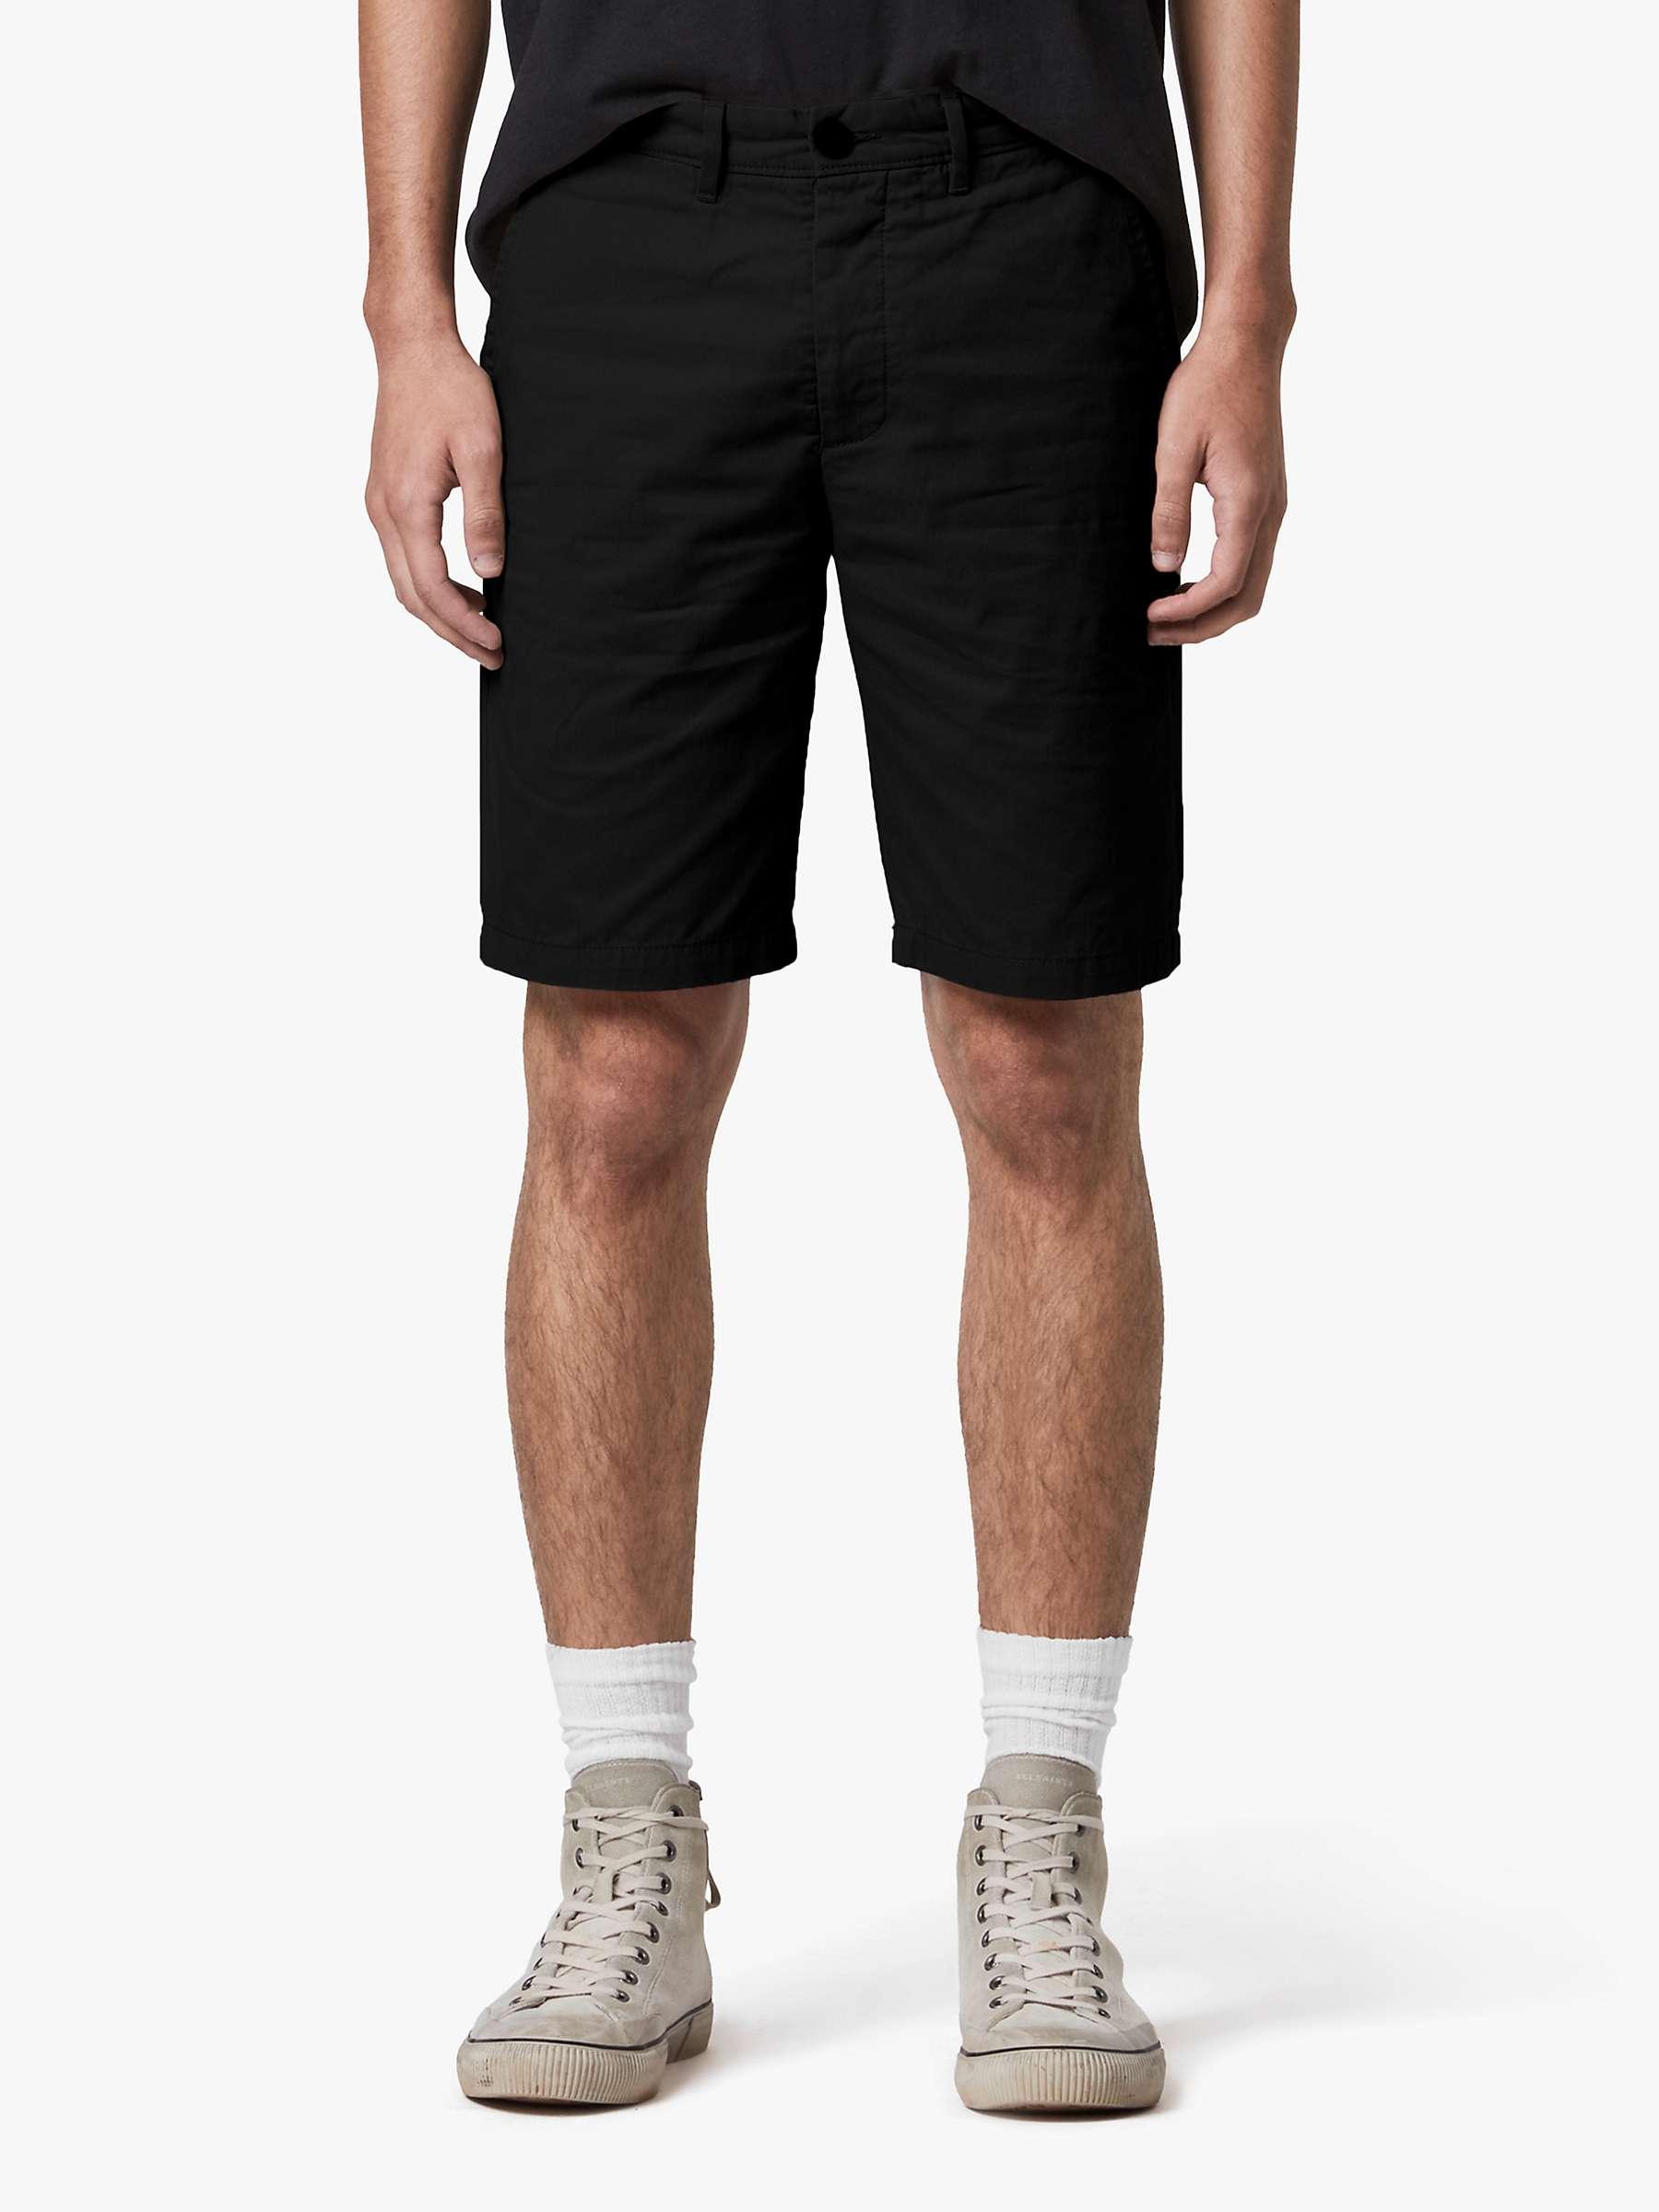 AllSaints Cobalt Chino Shorts, Black